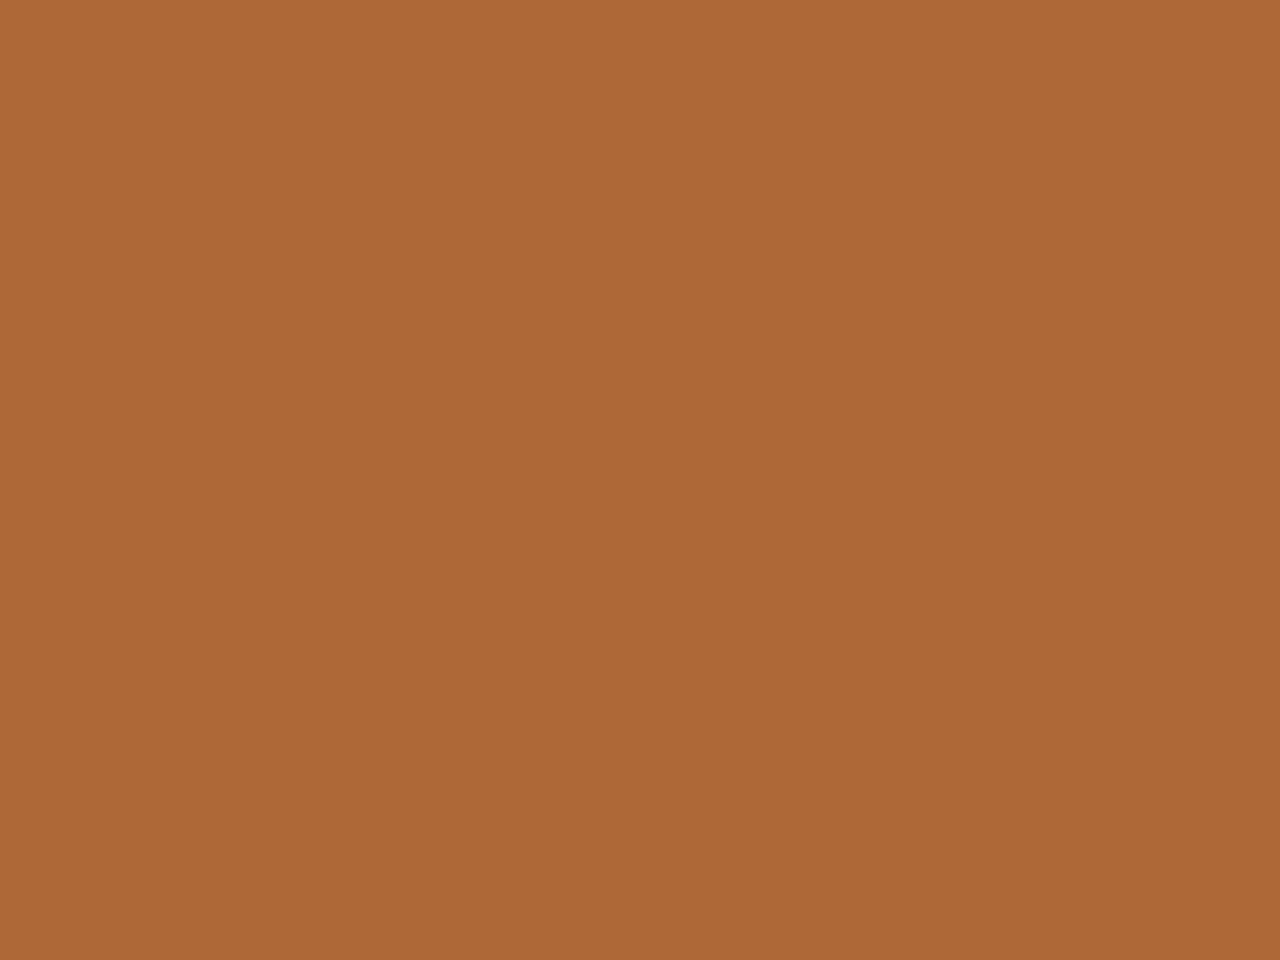 1280x960 Windsor Tan Solid Color Background